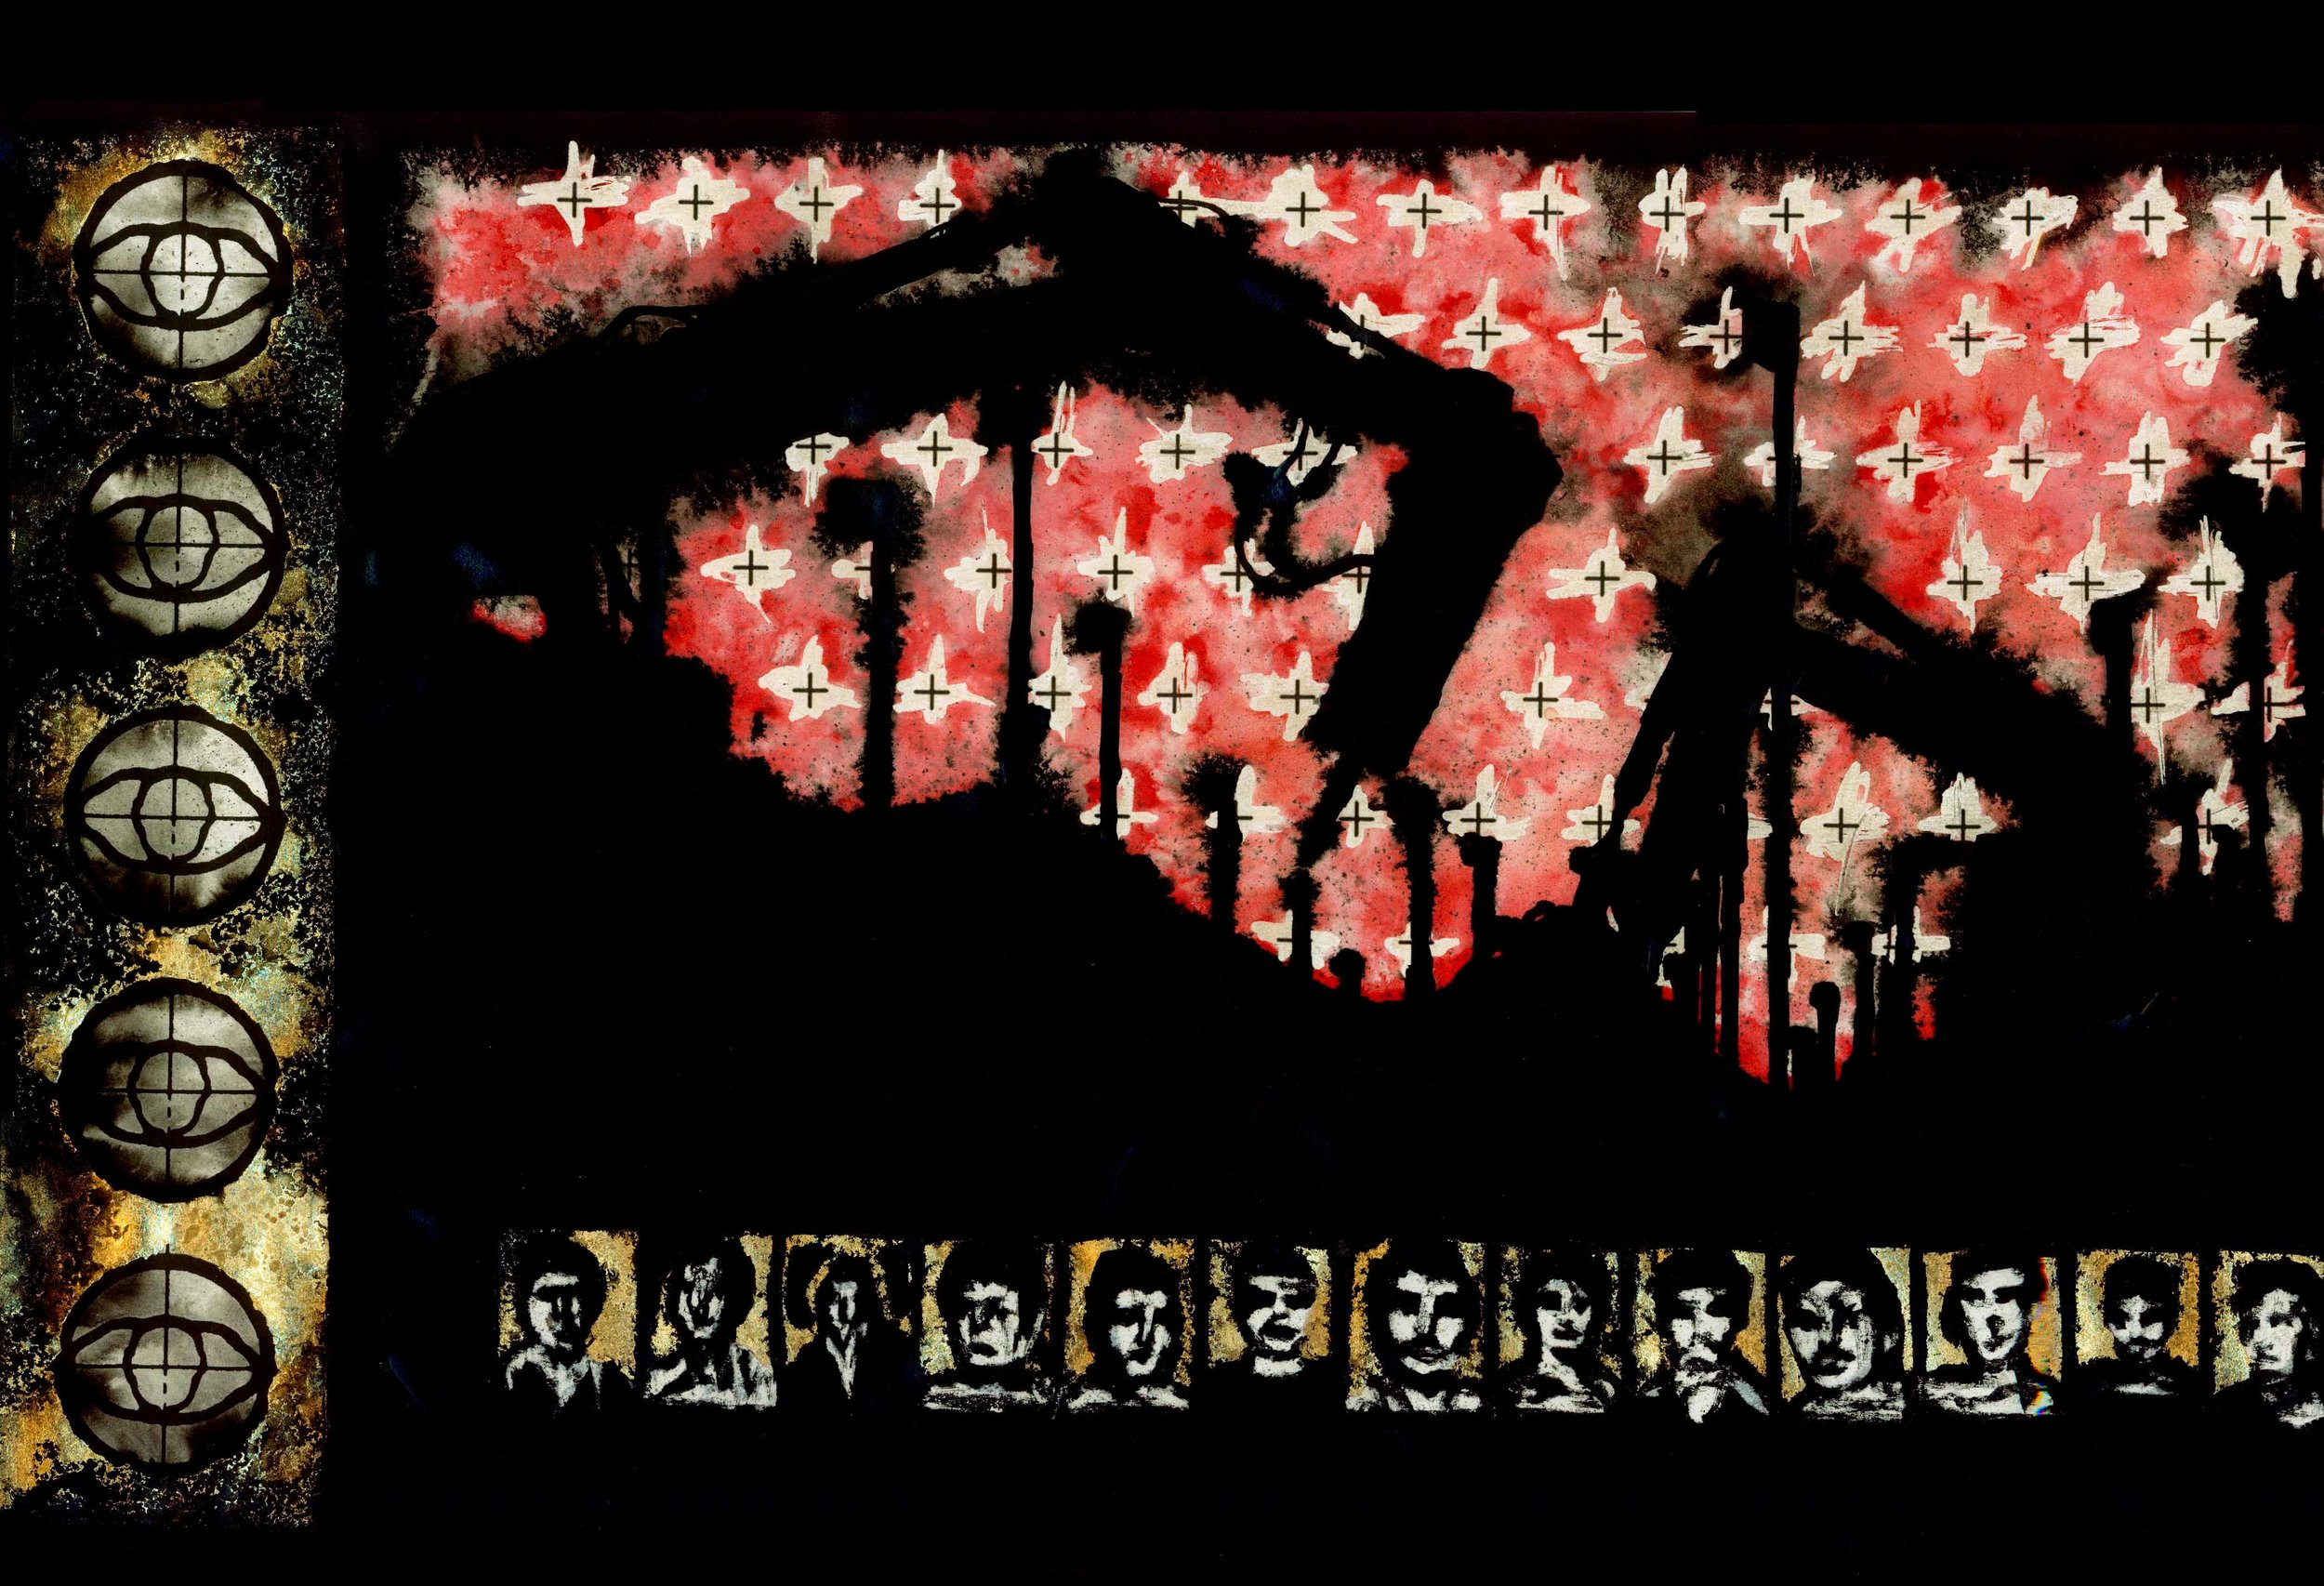 alfred_tarazi_the_oath_scheme_for_a_temporary_memorial_2015_2.jpg